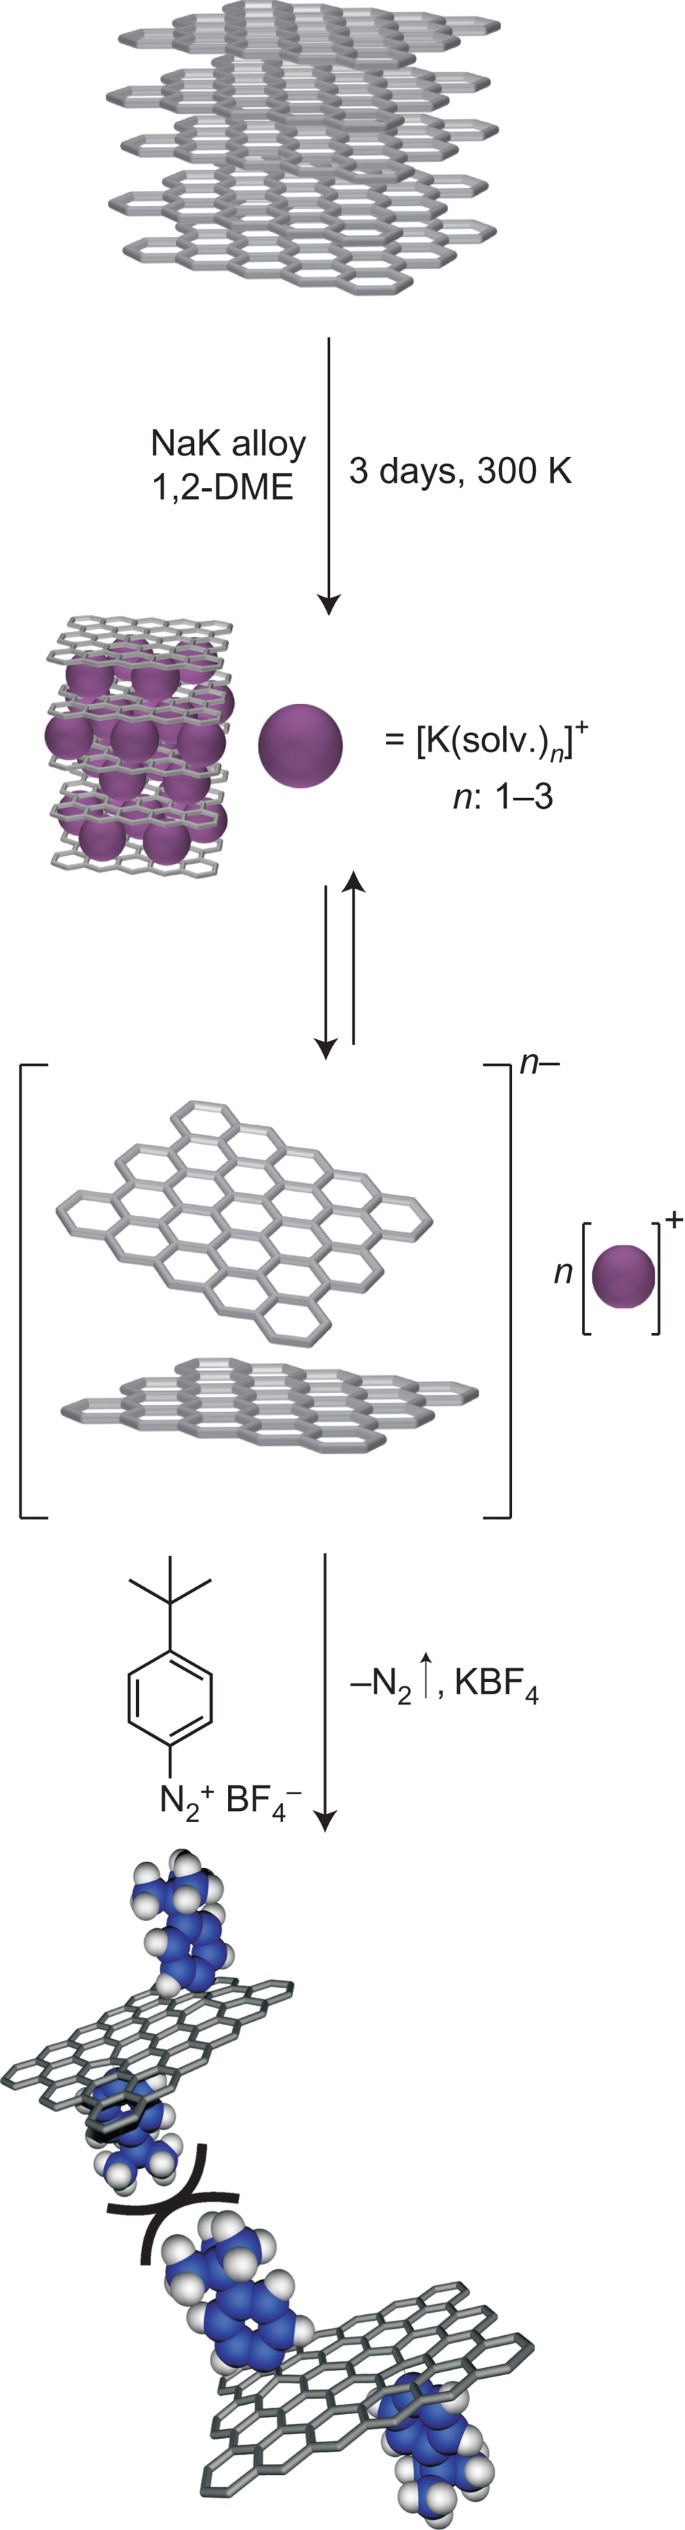 Covalent Bulk Functionalization Of Graphene | Nature Chemistry